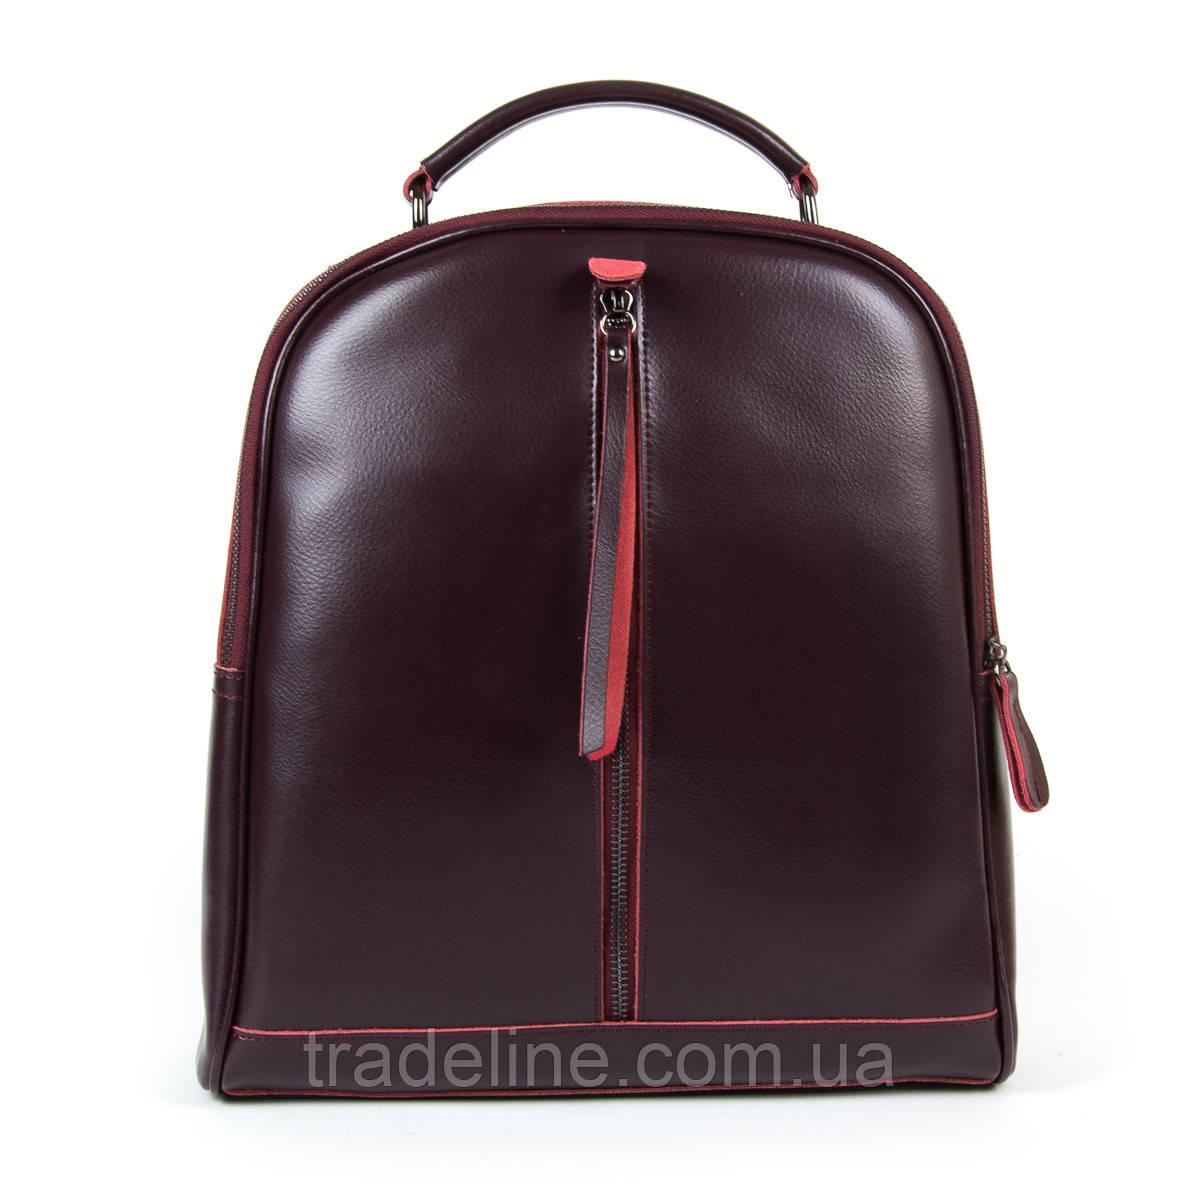 Сумка Женская Рюкзак кожа ALEX RAI 9-01 8694-3 wine-red